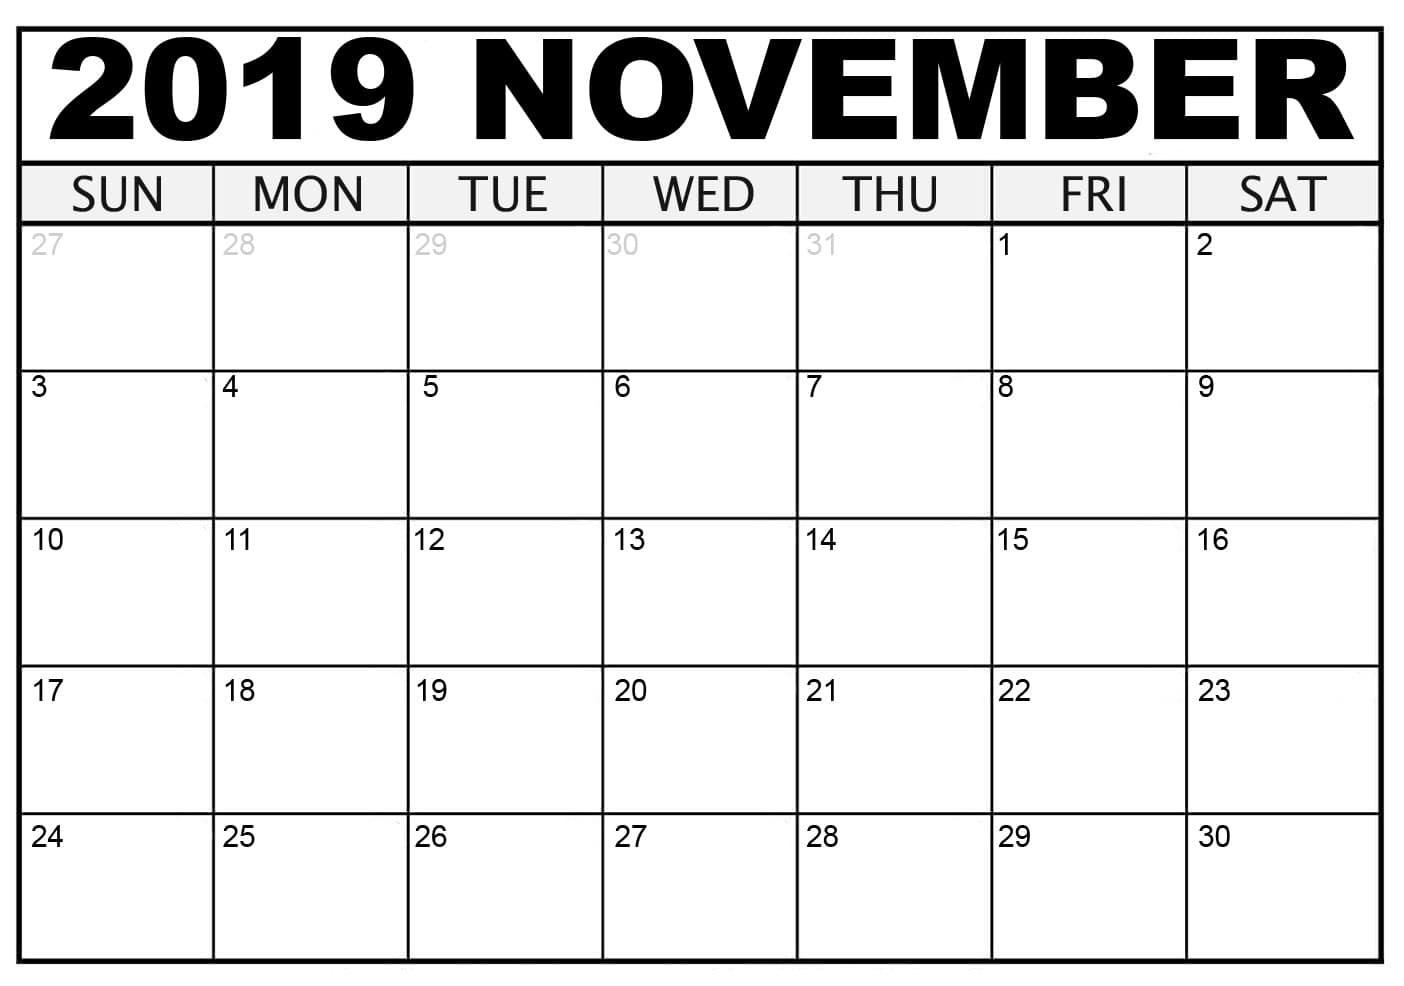 Blank November 2019 Calendar Excel Template